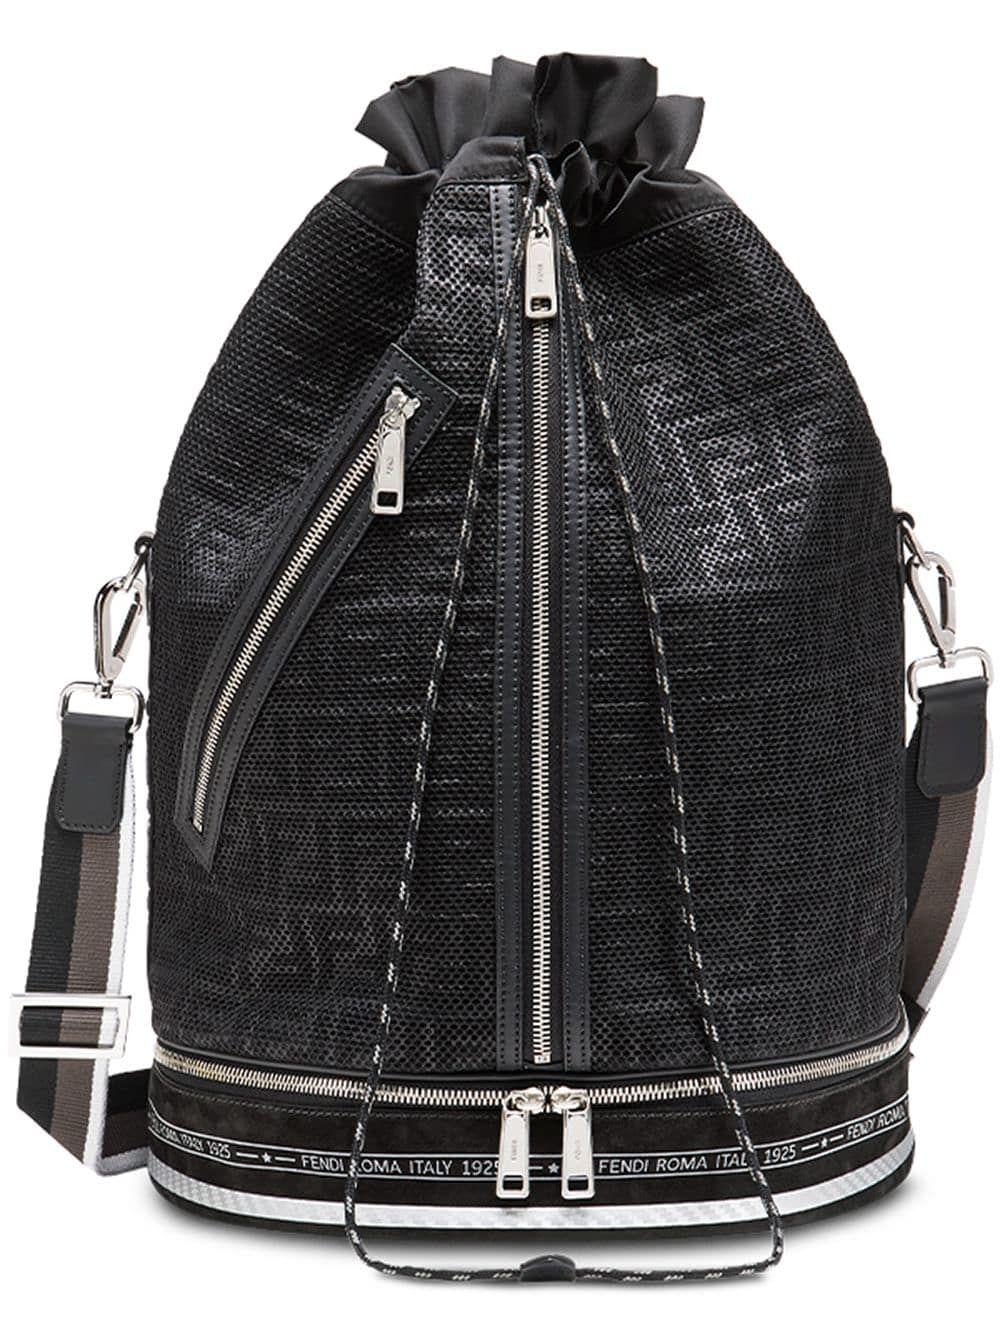 416b0b1c0773 FENDI FENDI MON TRESOR SPORTS BAG - BLACK.  fendi  bags  shoulder bags   leather